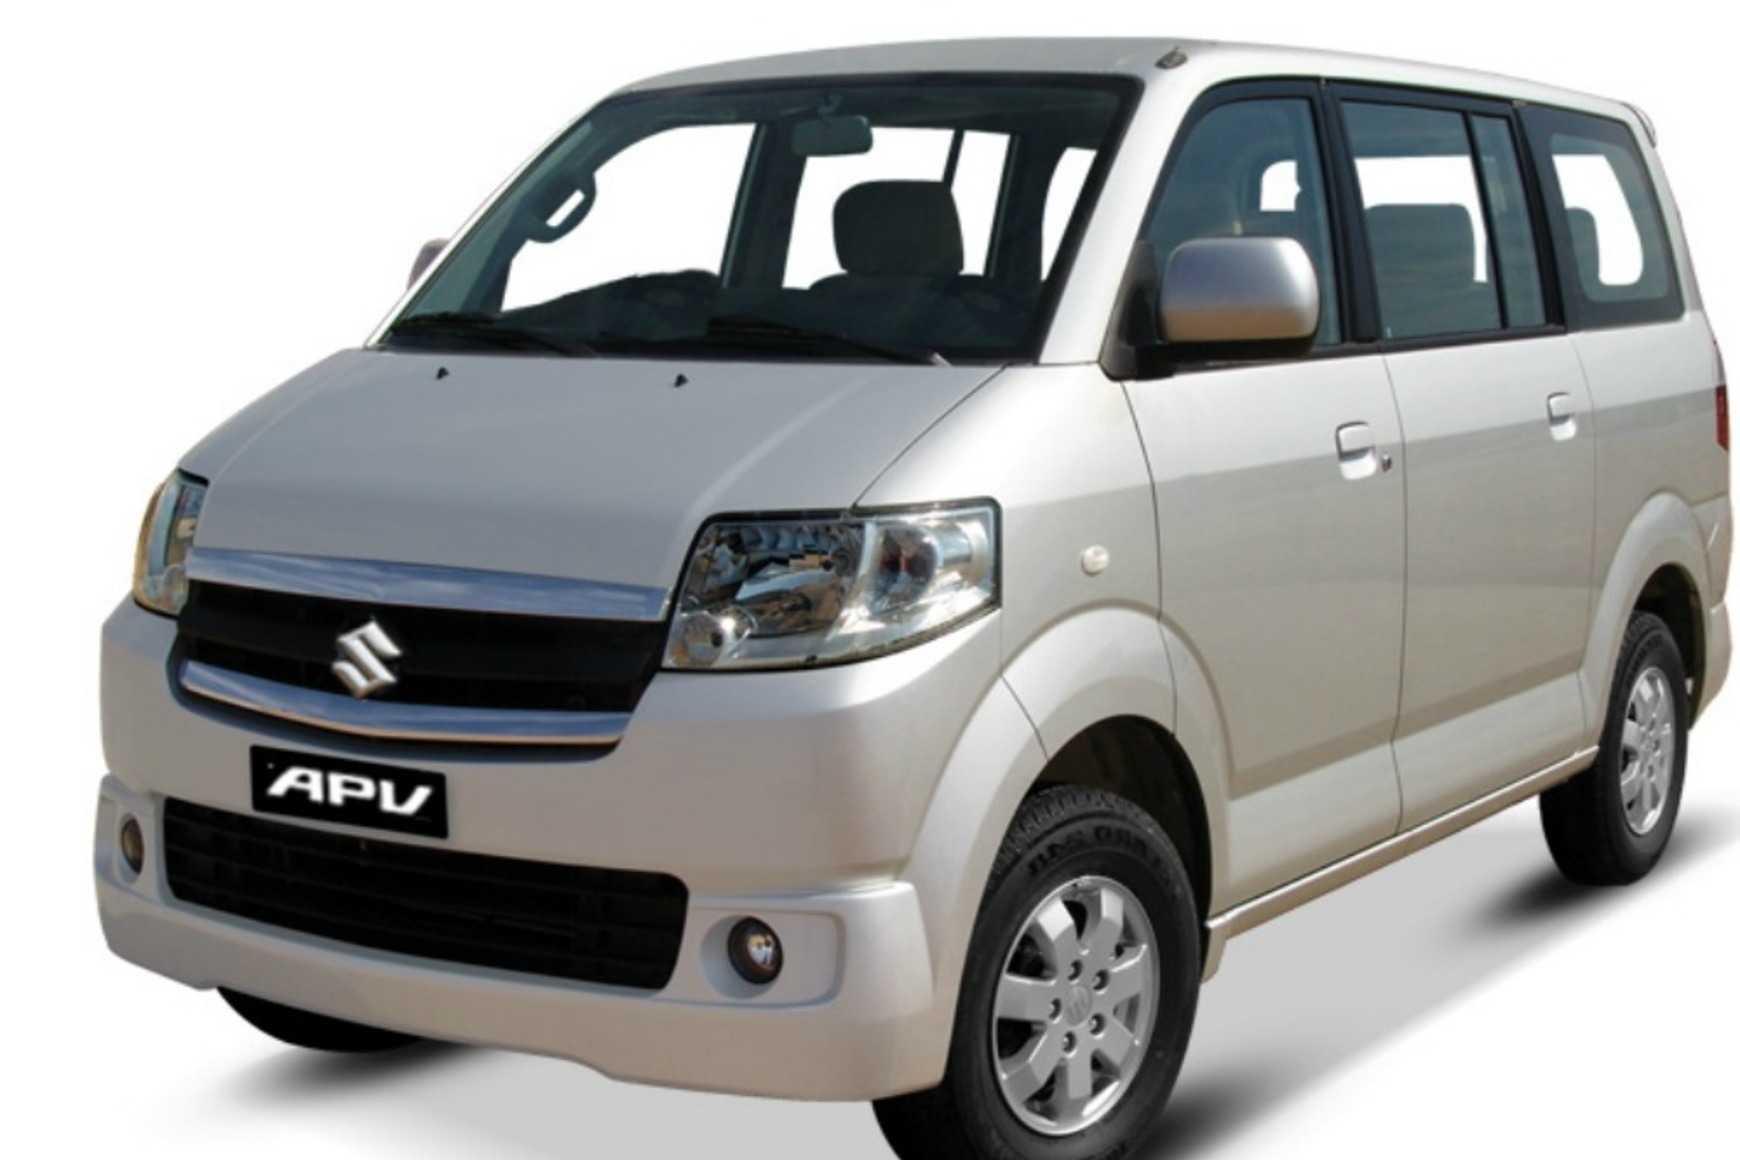 Suzuki APV Arena Manual | Dian Car Bali - Sewa menyewa jadi lebih mudah di Spotsewa